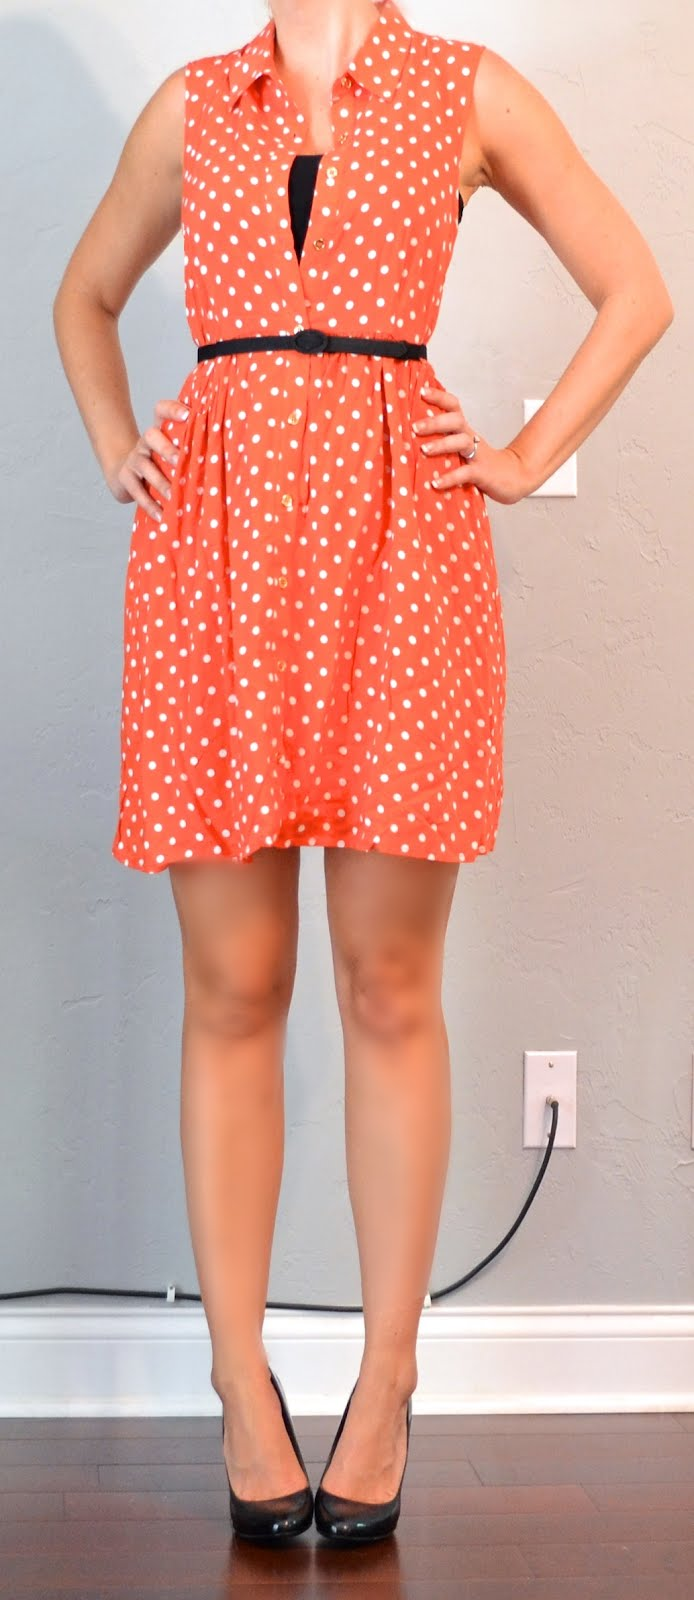 Outfit Post Orange Polka Dot Dress